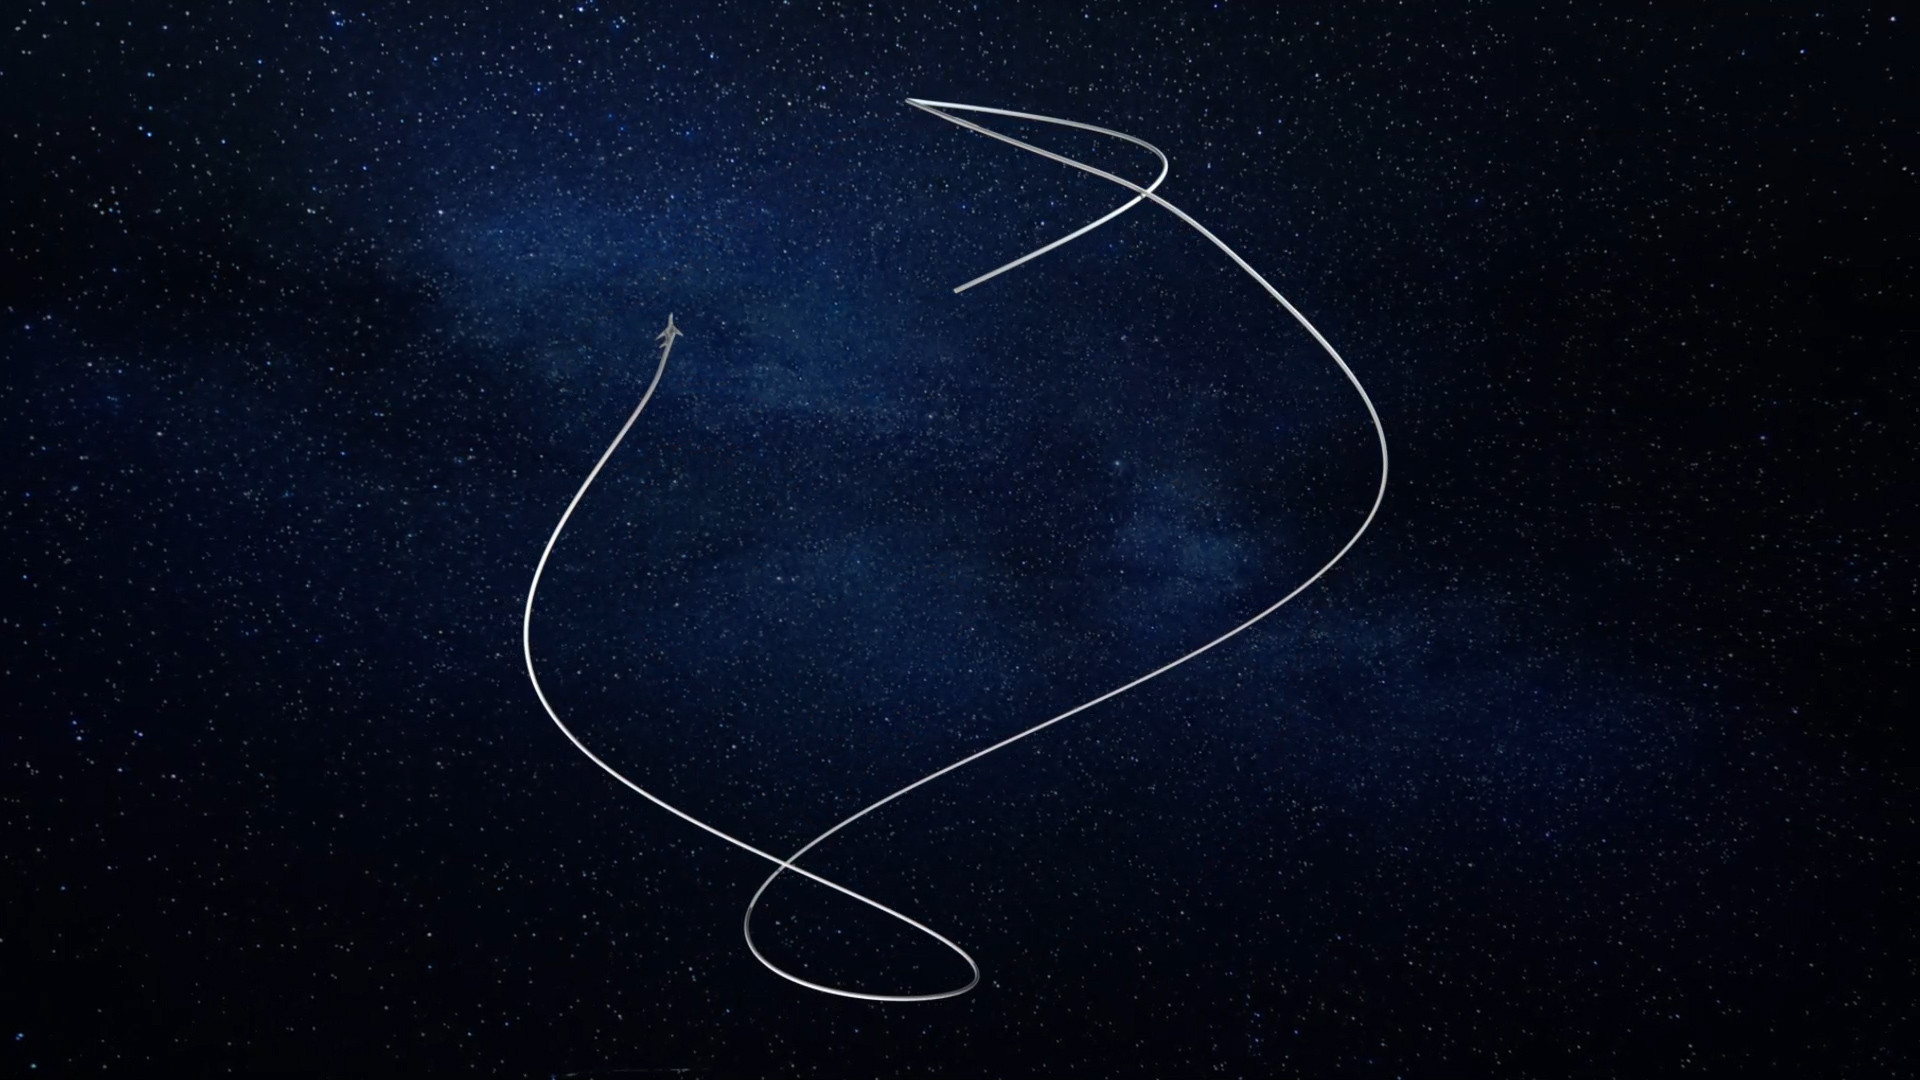 08. One More Orbit Flight Path